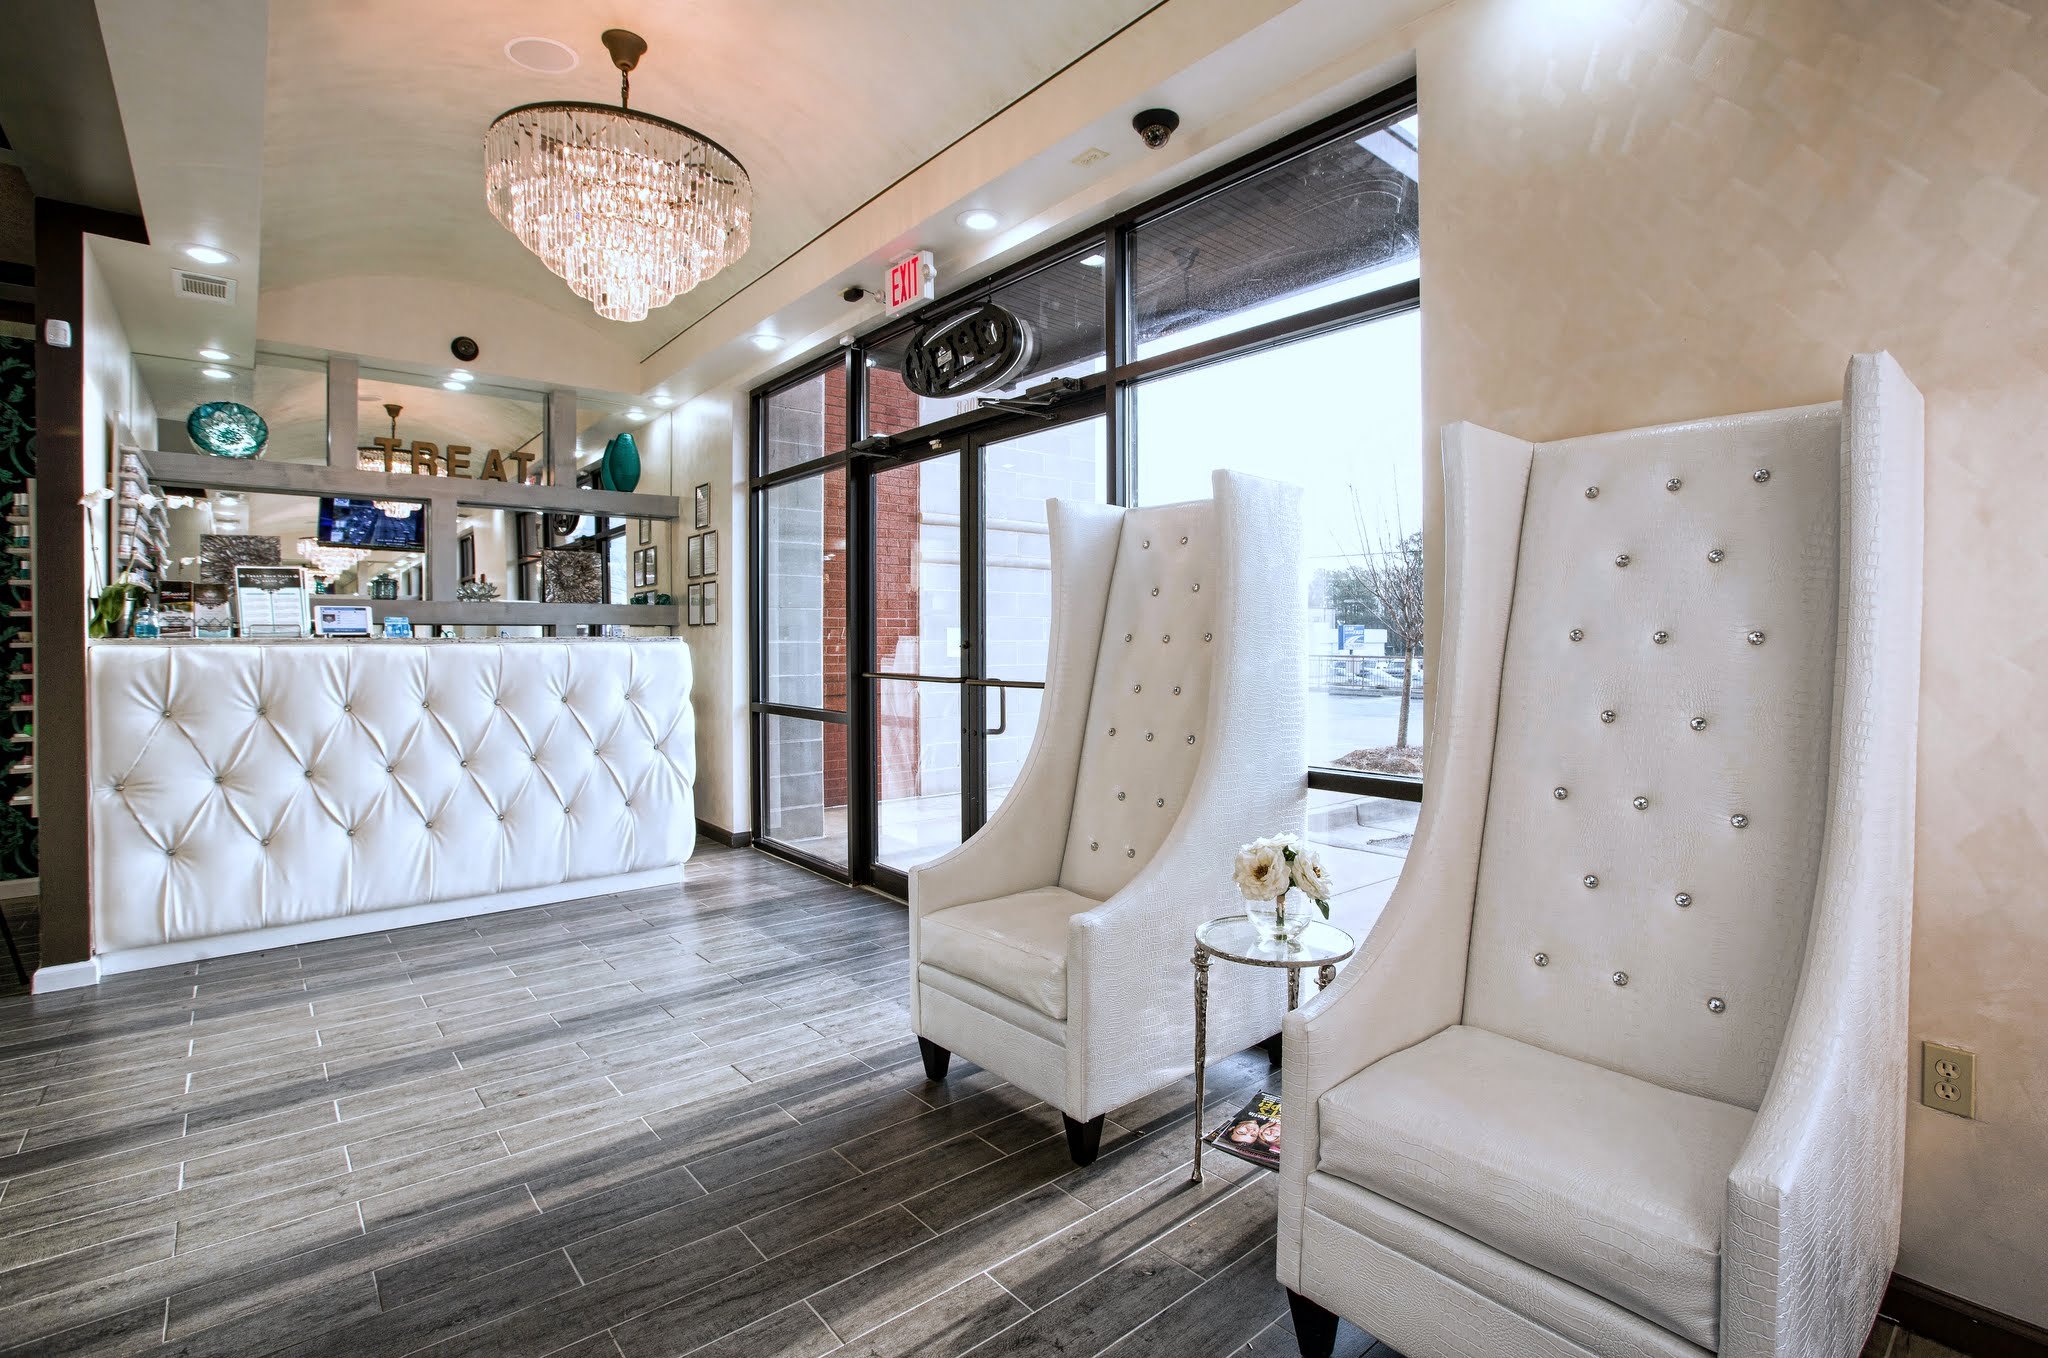 Doraville Nail Salon Waiting Area - Treat Your Nails